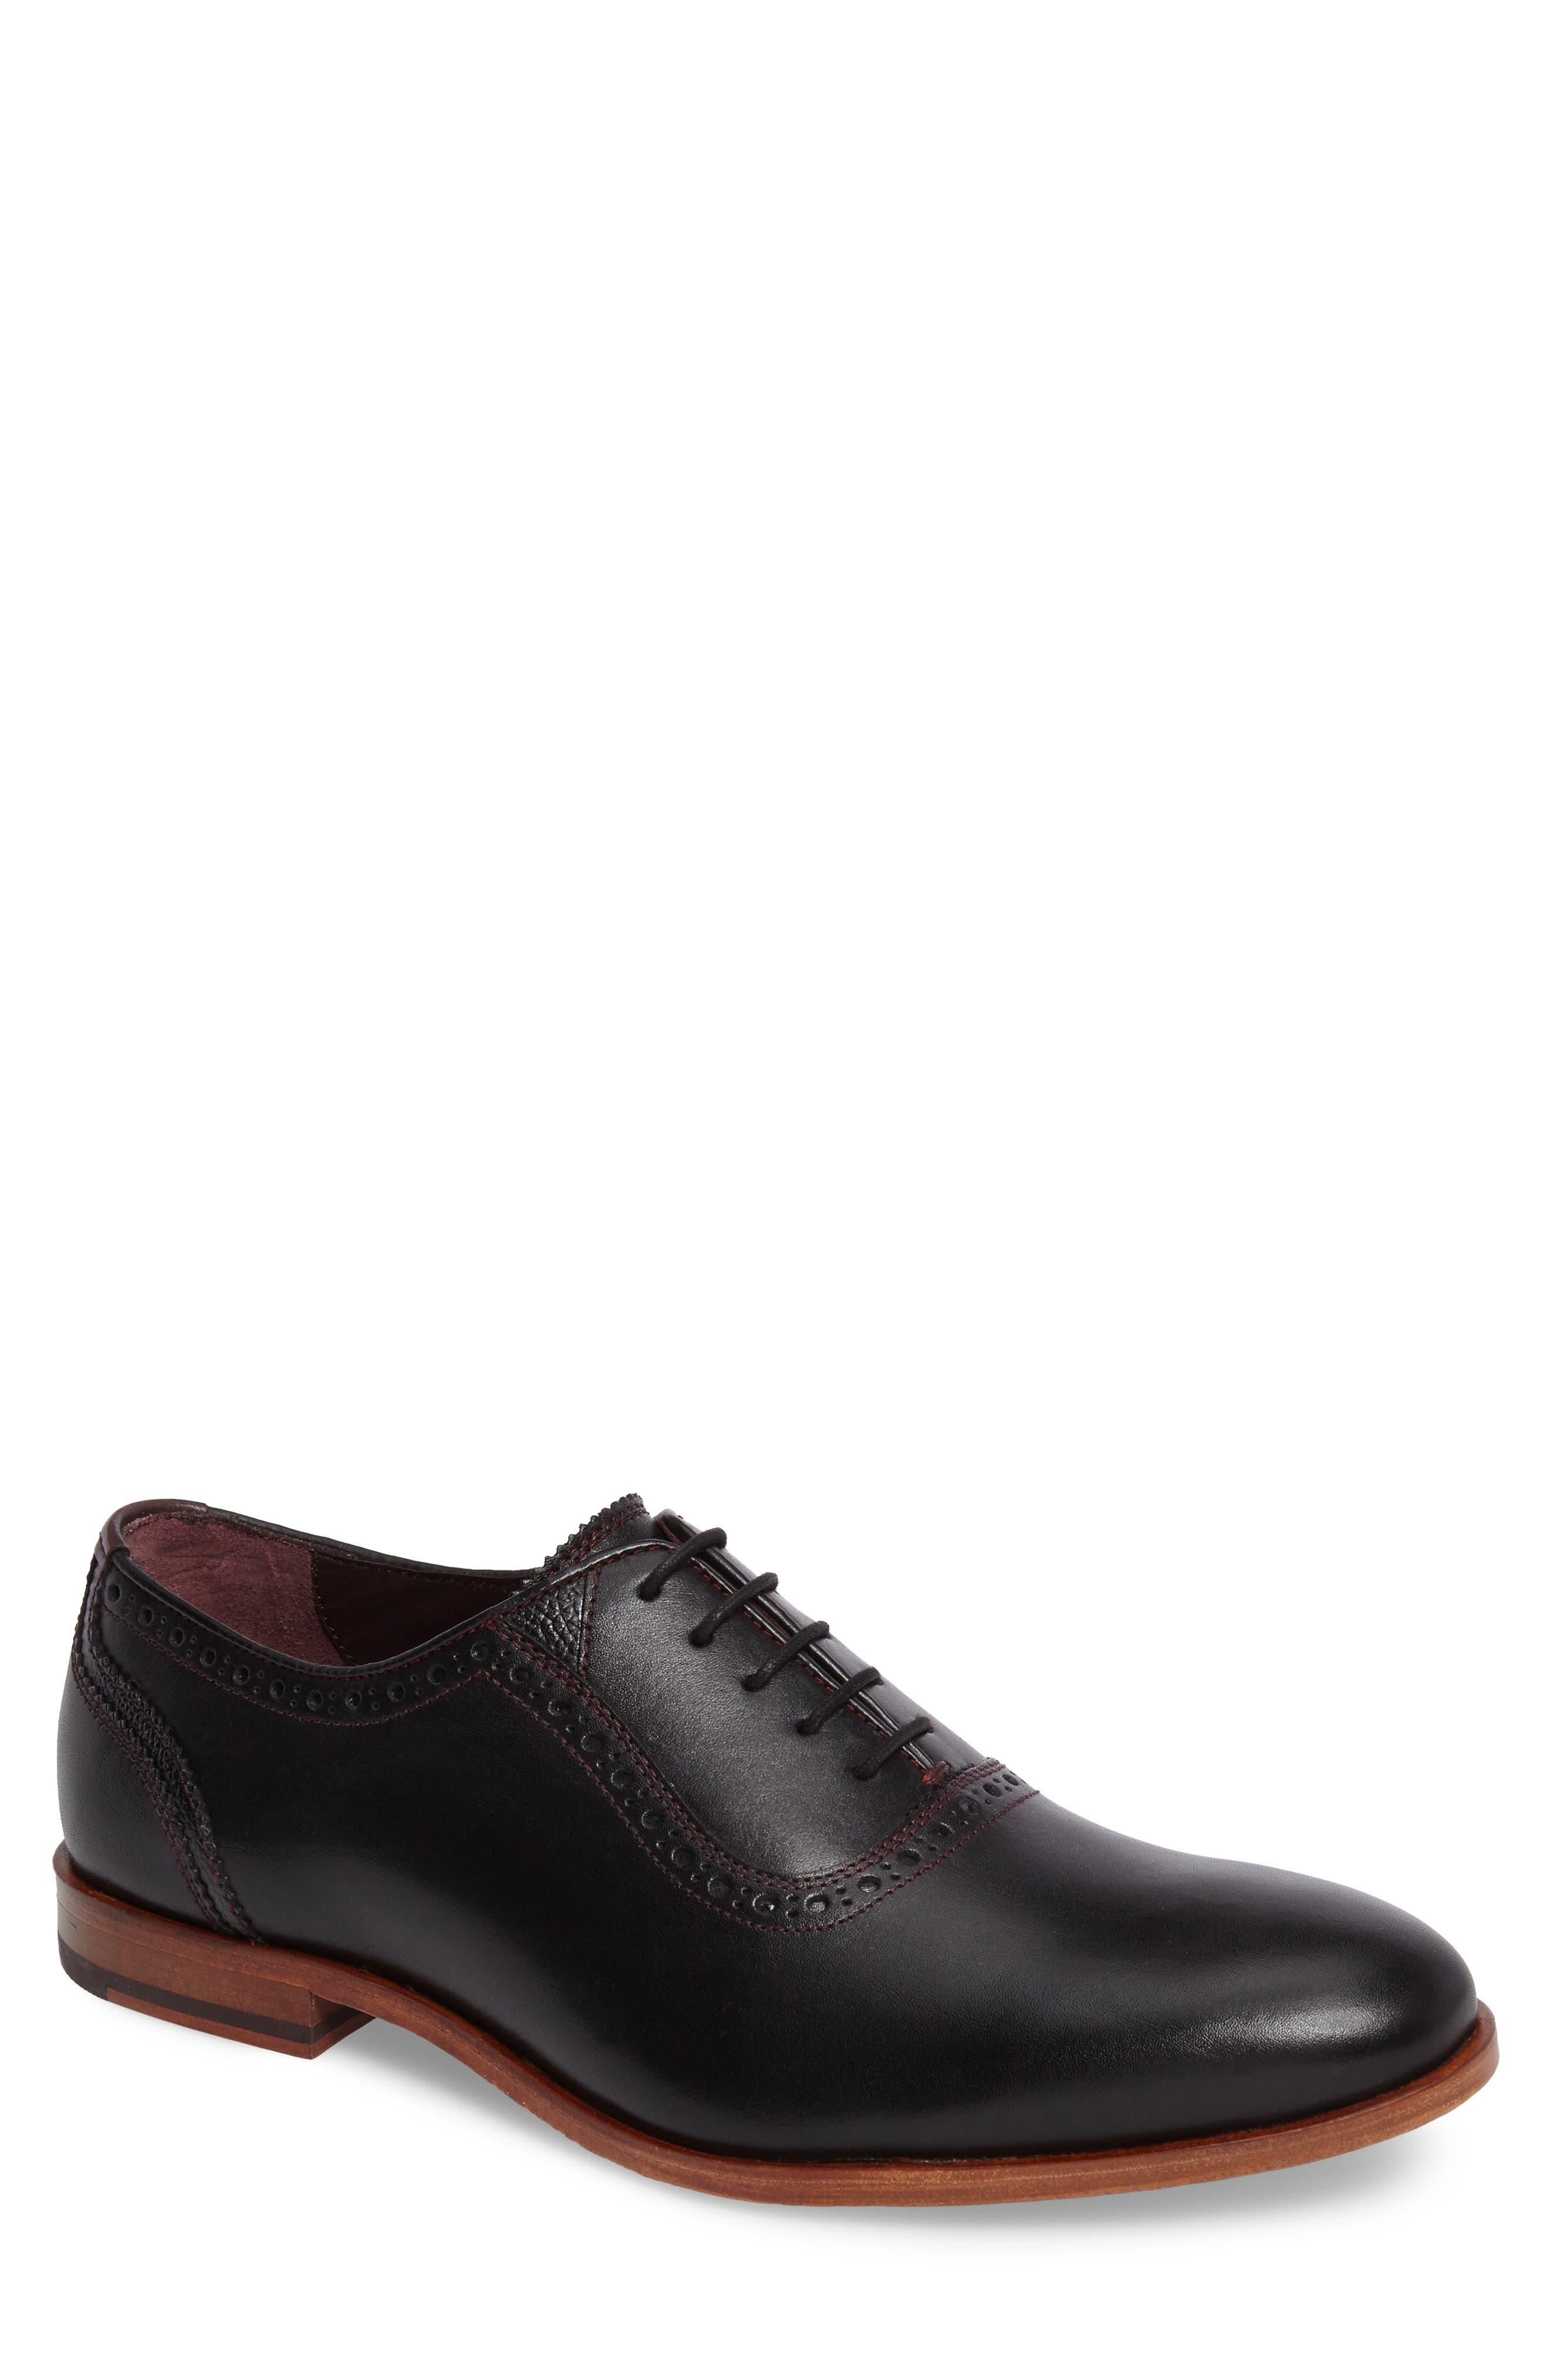 Anice Plain Toe Oxford,                         Main,                         color, Black Leather